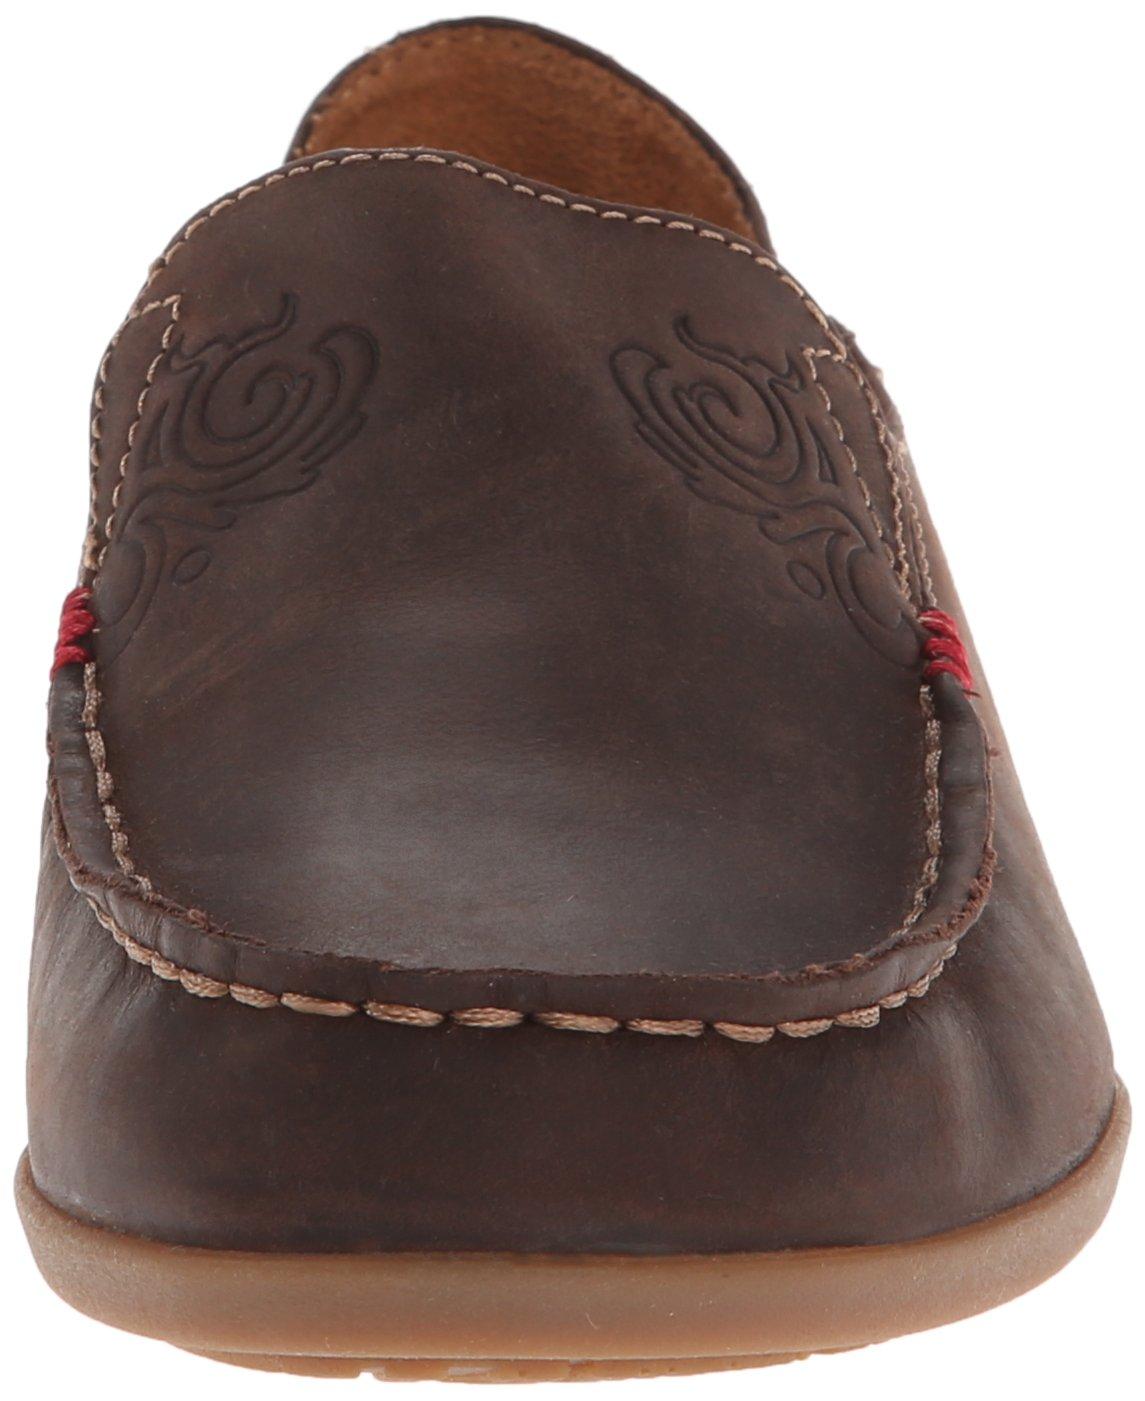 OLUKAI Pehuea Shoes M - Women's B006T6CT4E 6.5 M Shoes US|Dark Java/Tan 61c576